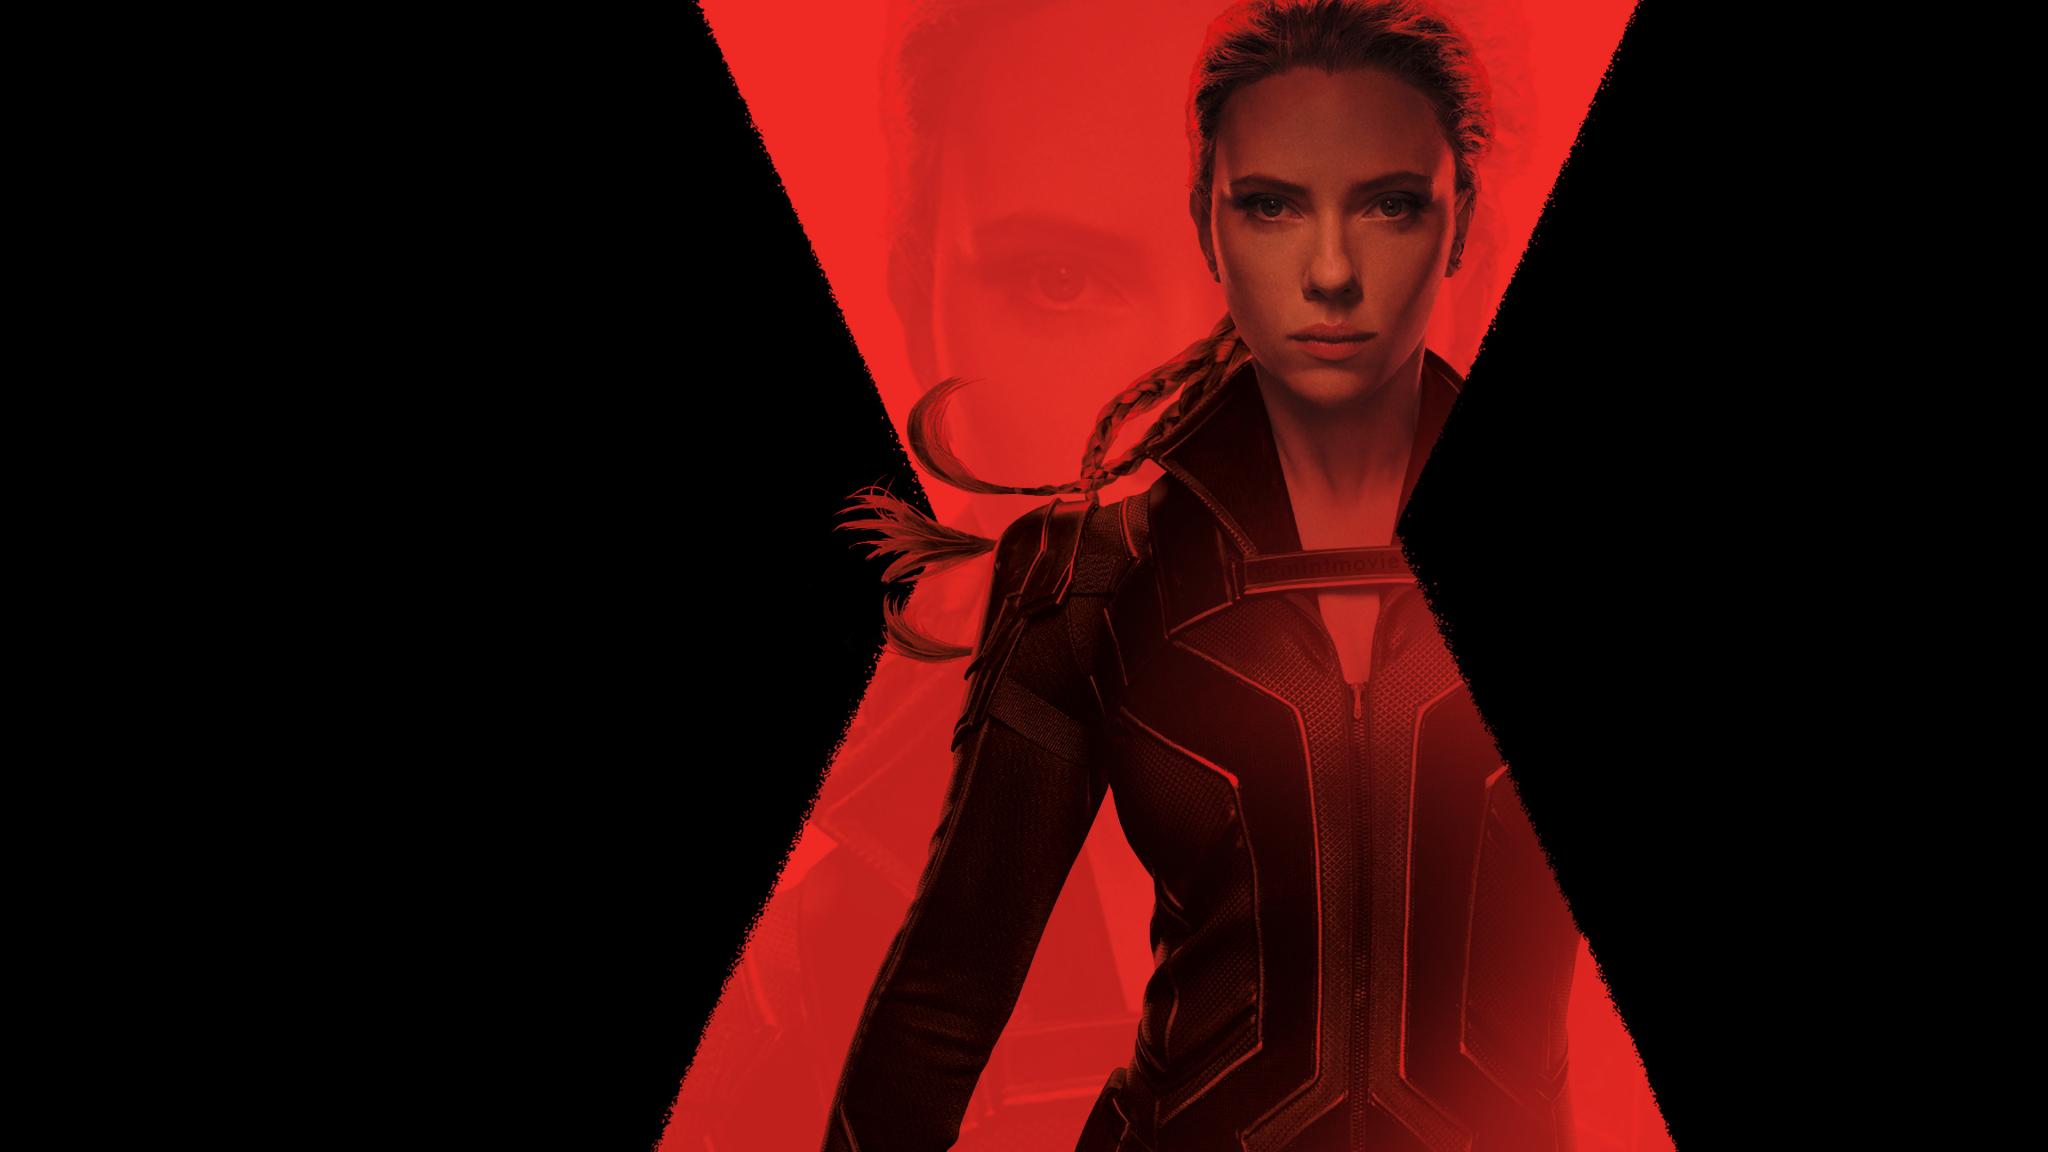 2048x1152 4K Black Widow Movie 2048x1152 Resolution ...